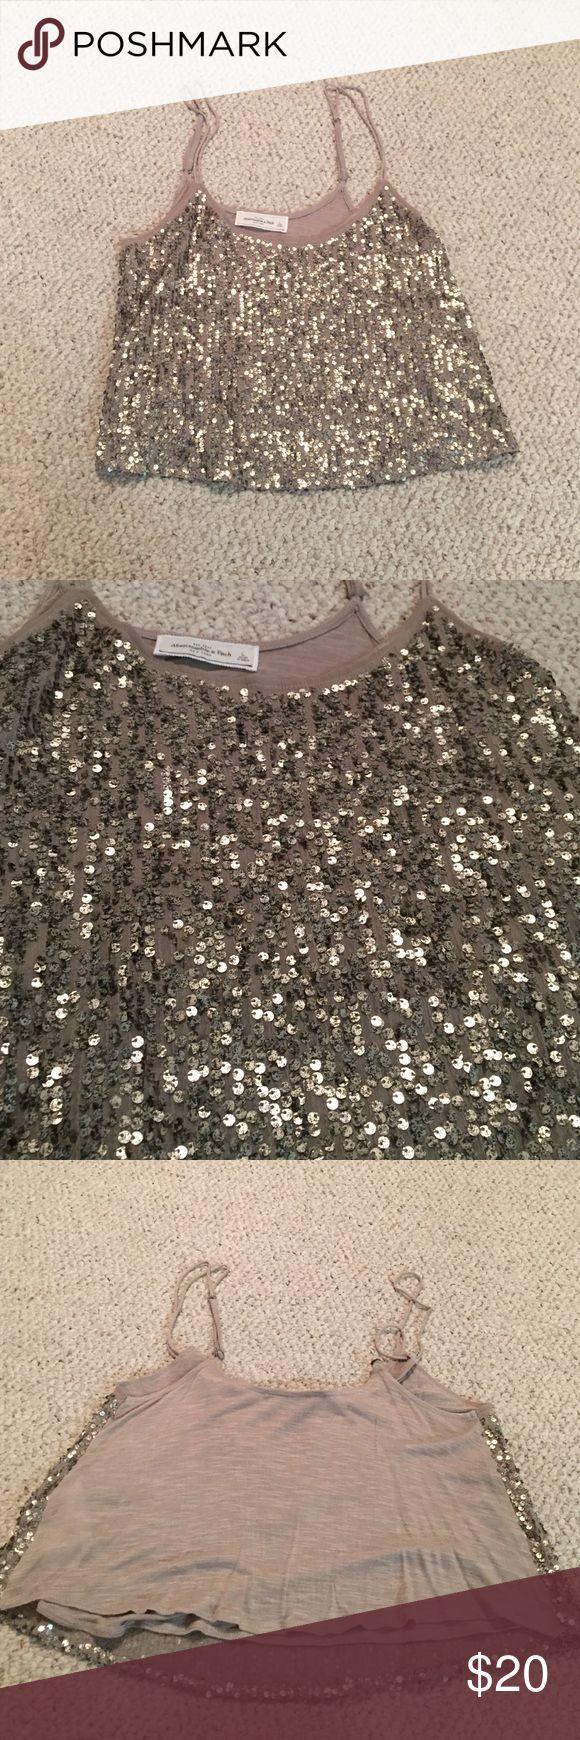 Sparkly crop top Gold/bronze sparkles, never been worn, adjustable straps, crop top Abercrombie & Fitch Tops Crop Tops